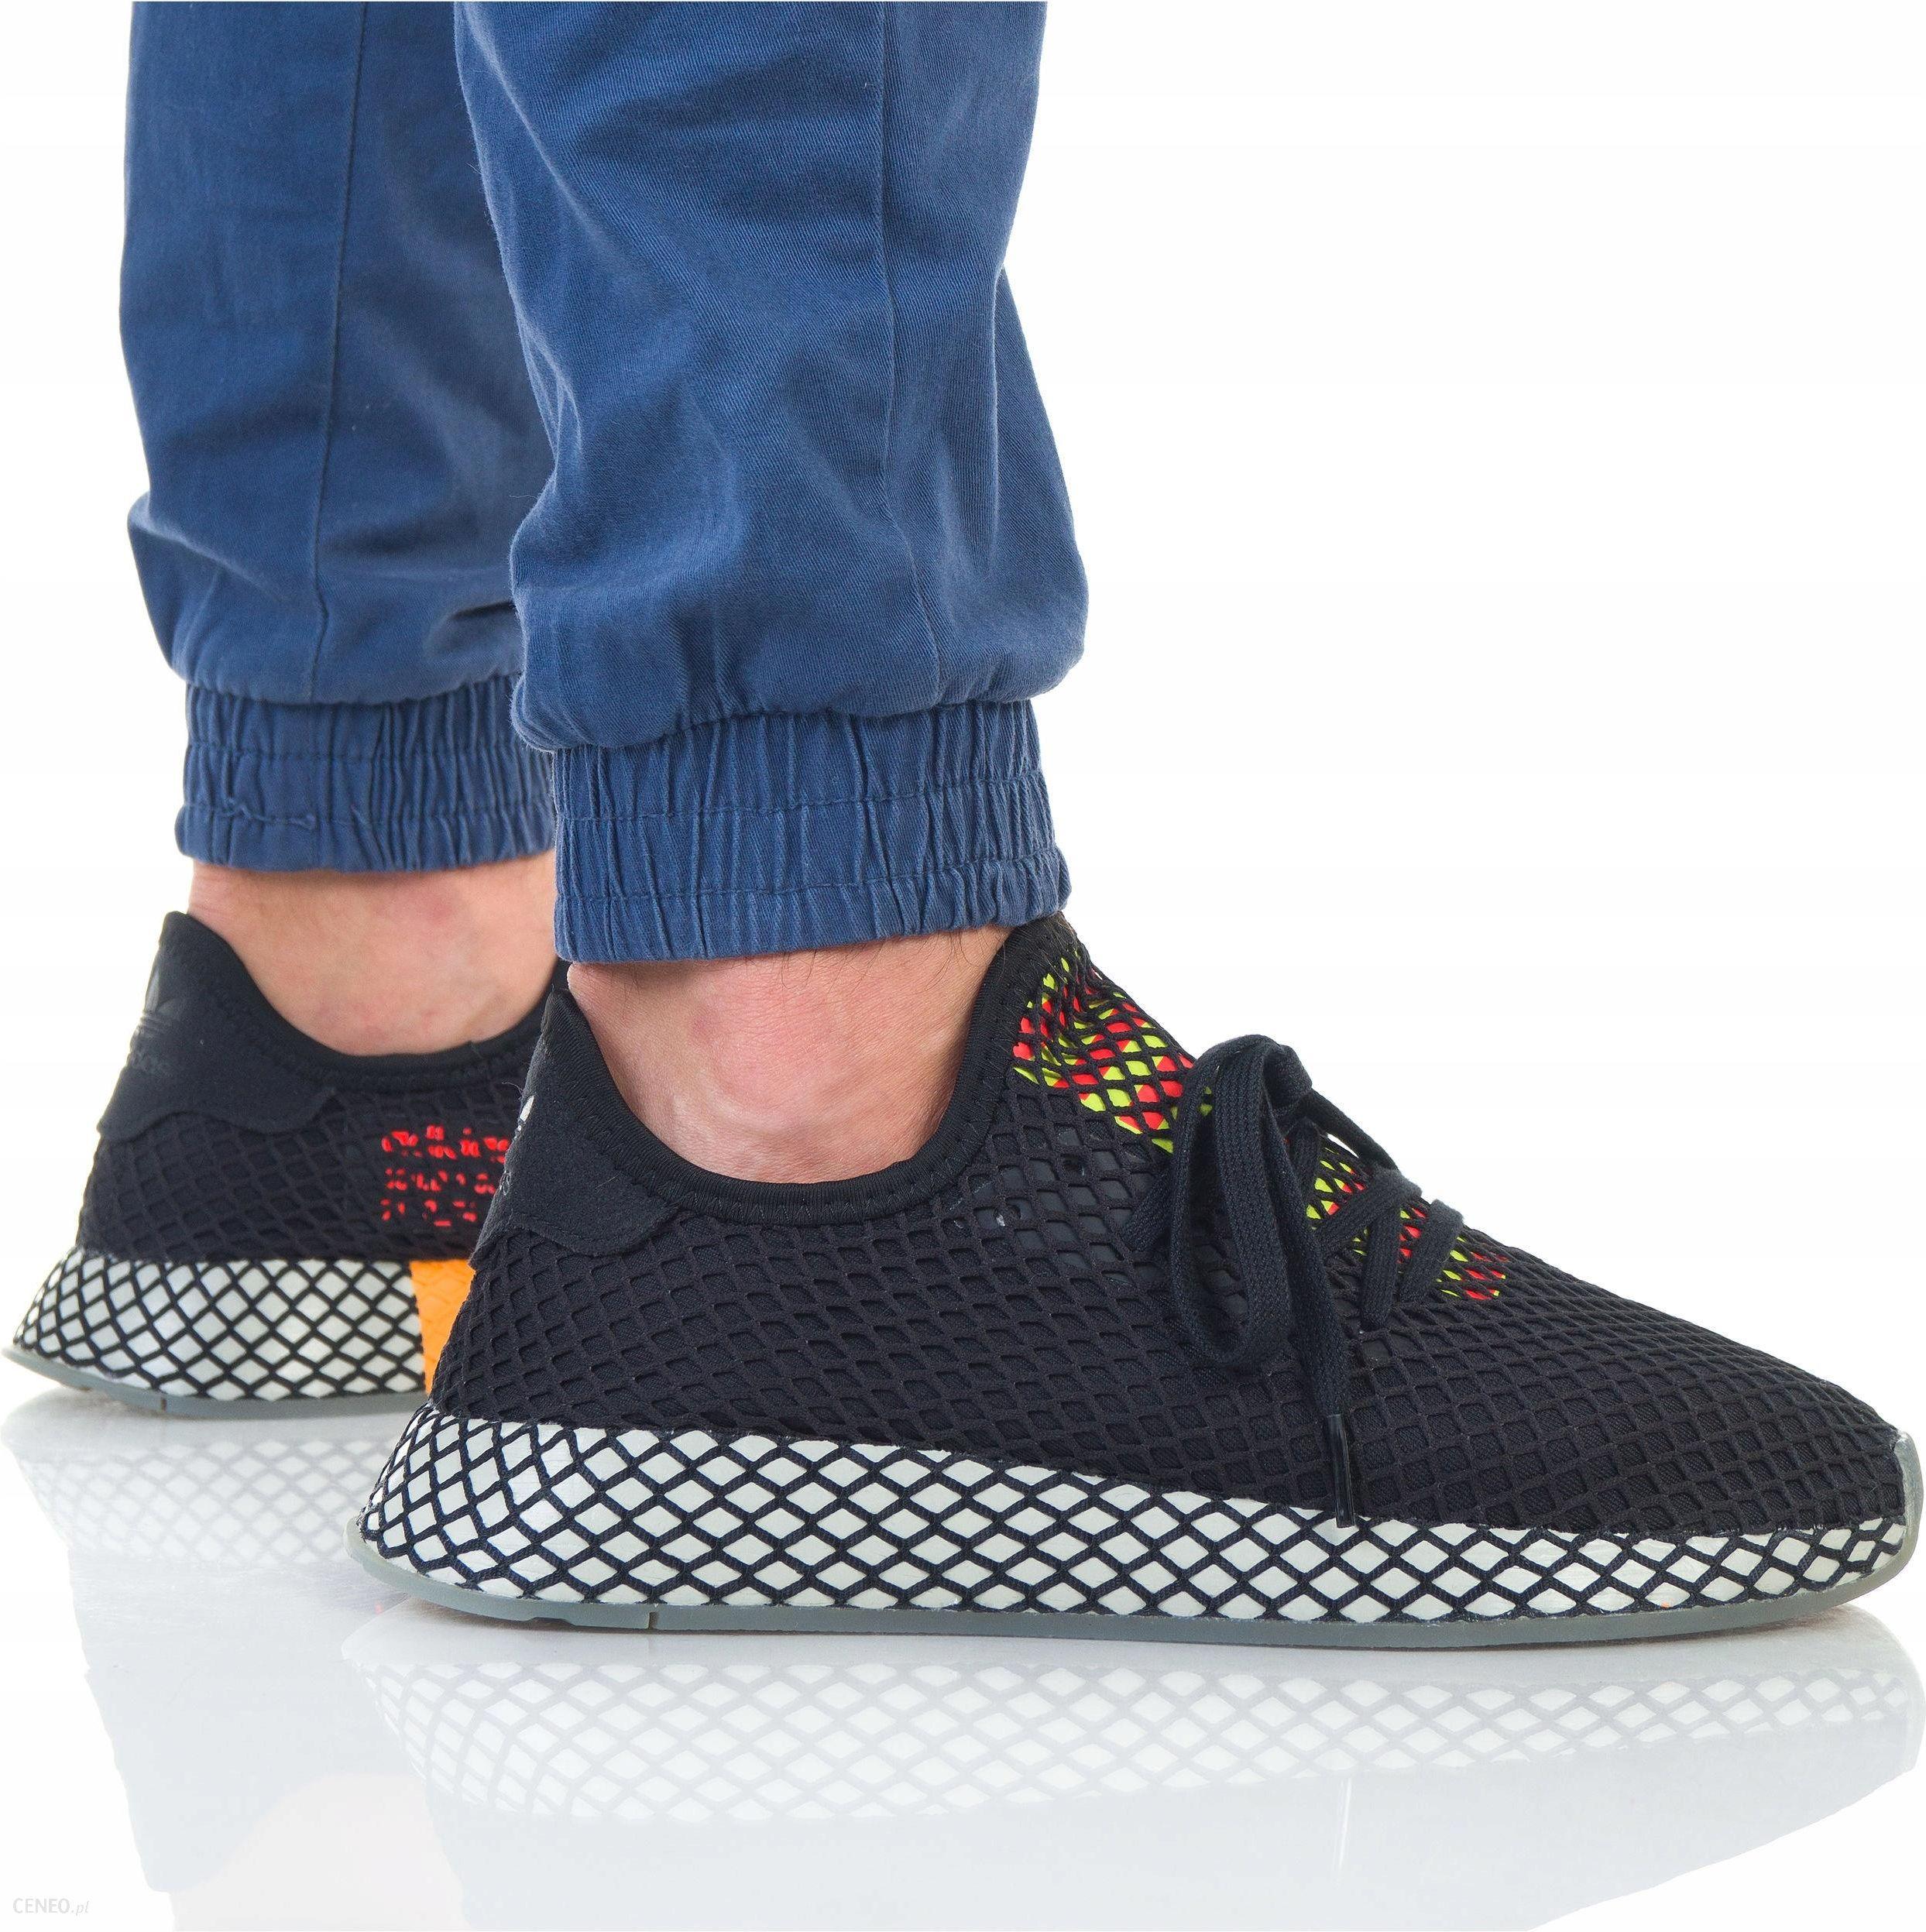 ADIDAS TUBULAR SHADOW kolor SZARY (B37595) Męskie Sneakersy – GaleriaMarek.pl